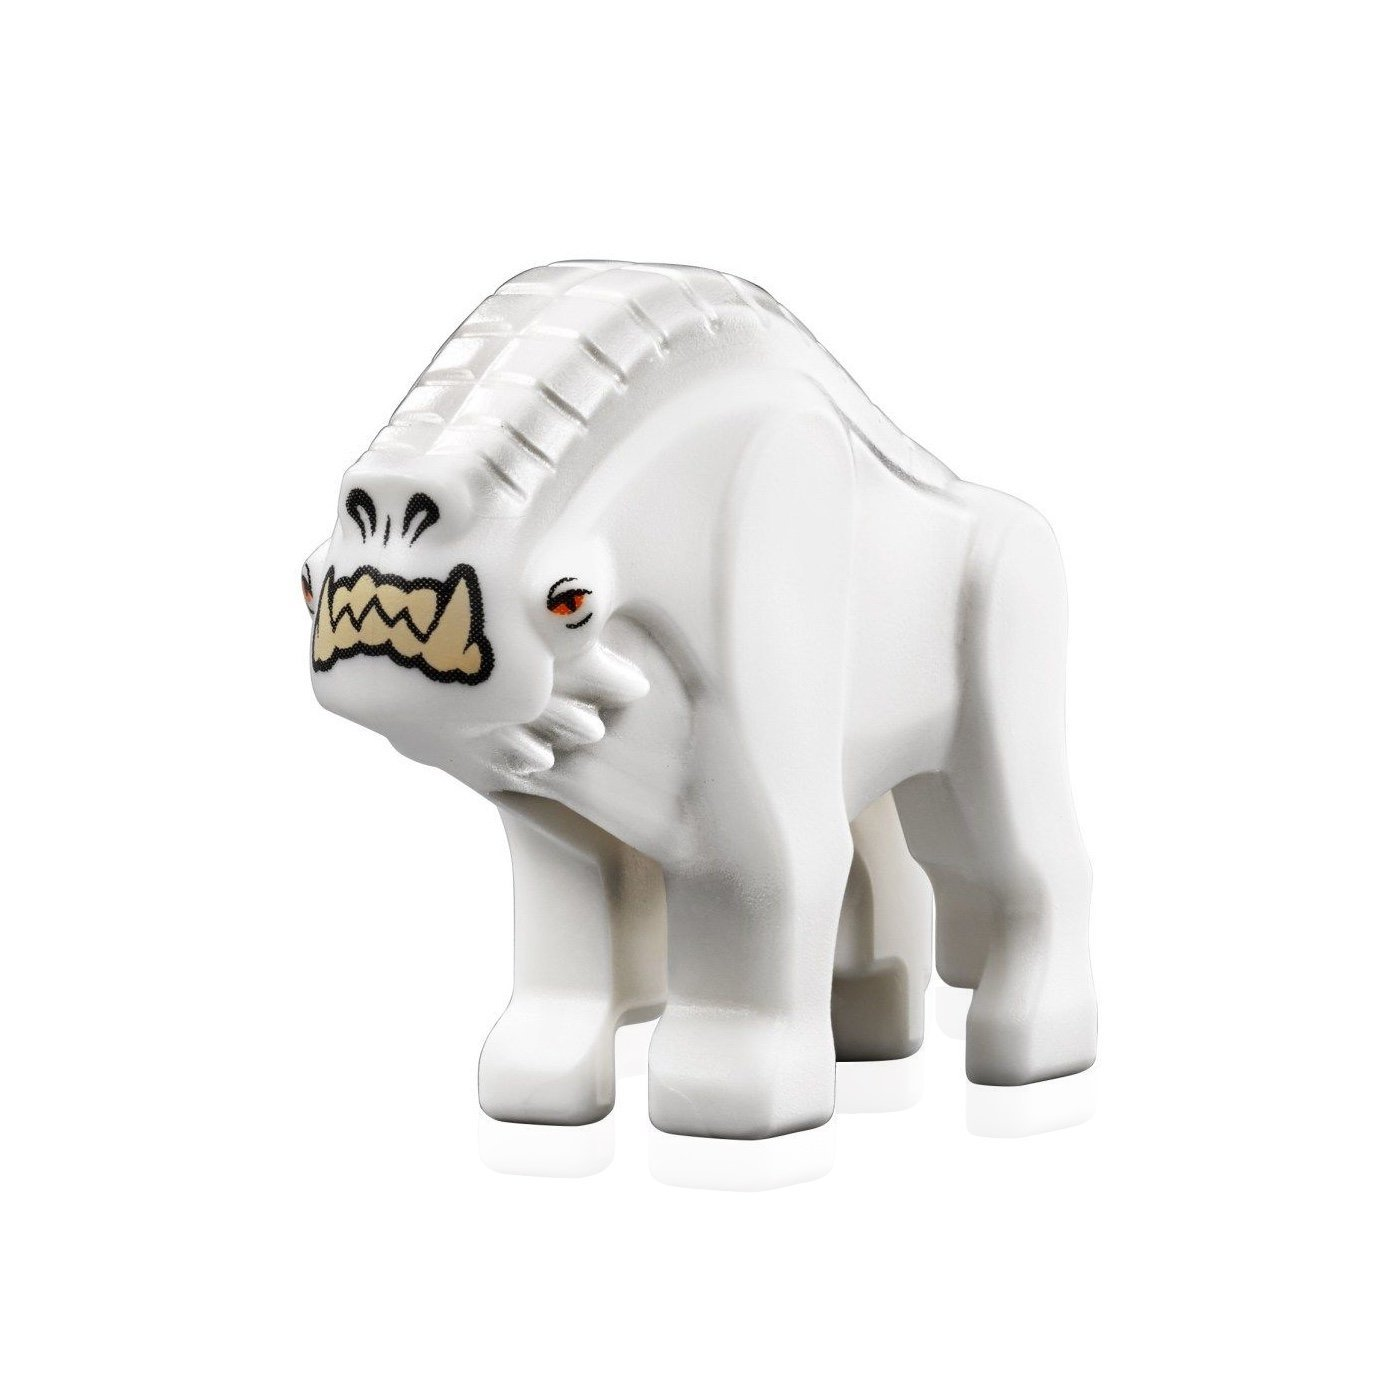 Solo: ASWS Corellian Hound Lego Mini Figure